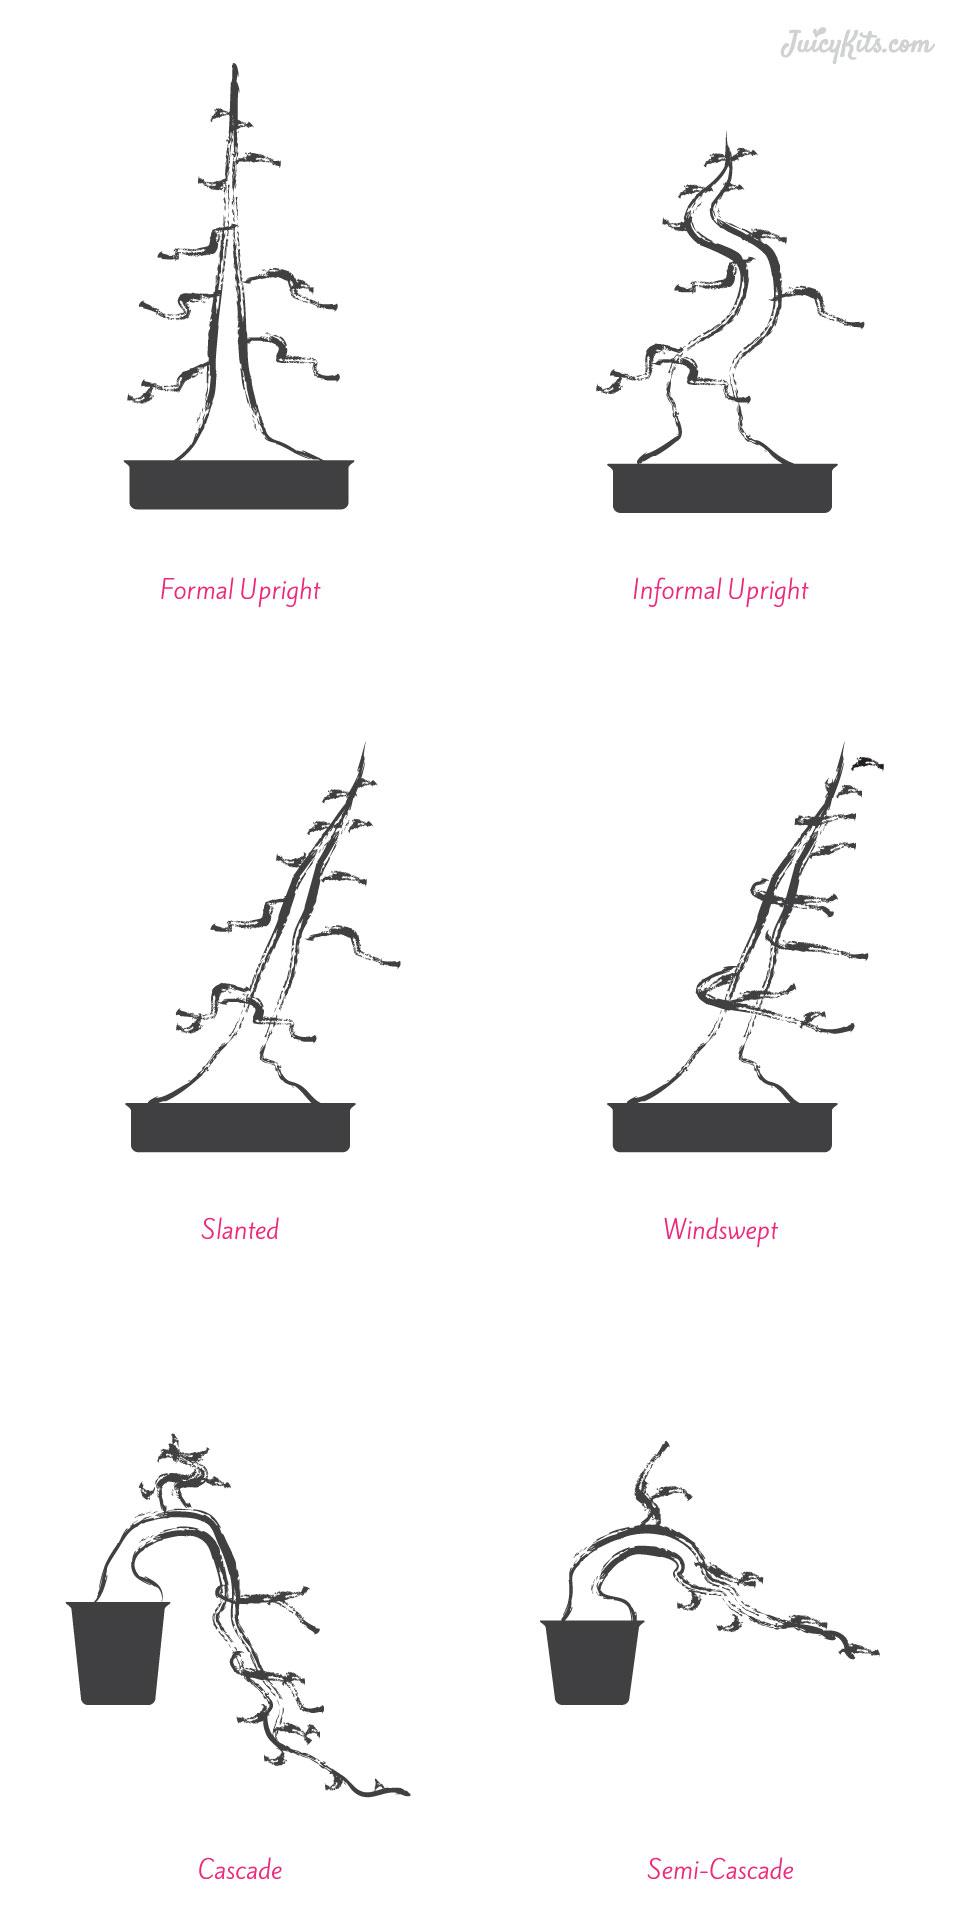 The Basics Of Succulent Bonsai Tree Wiring Video Main Styles